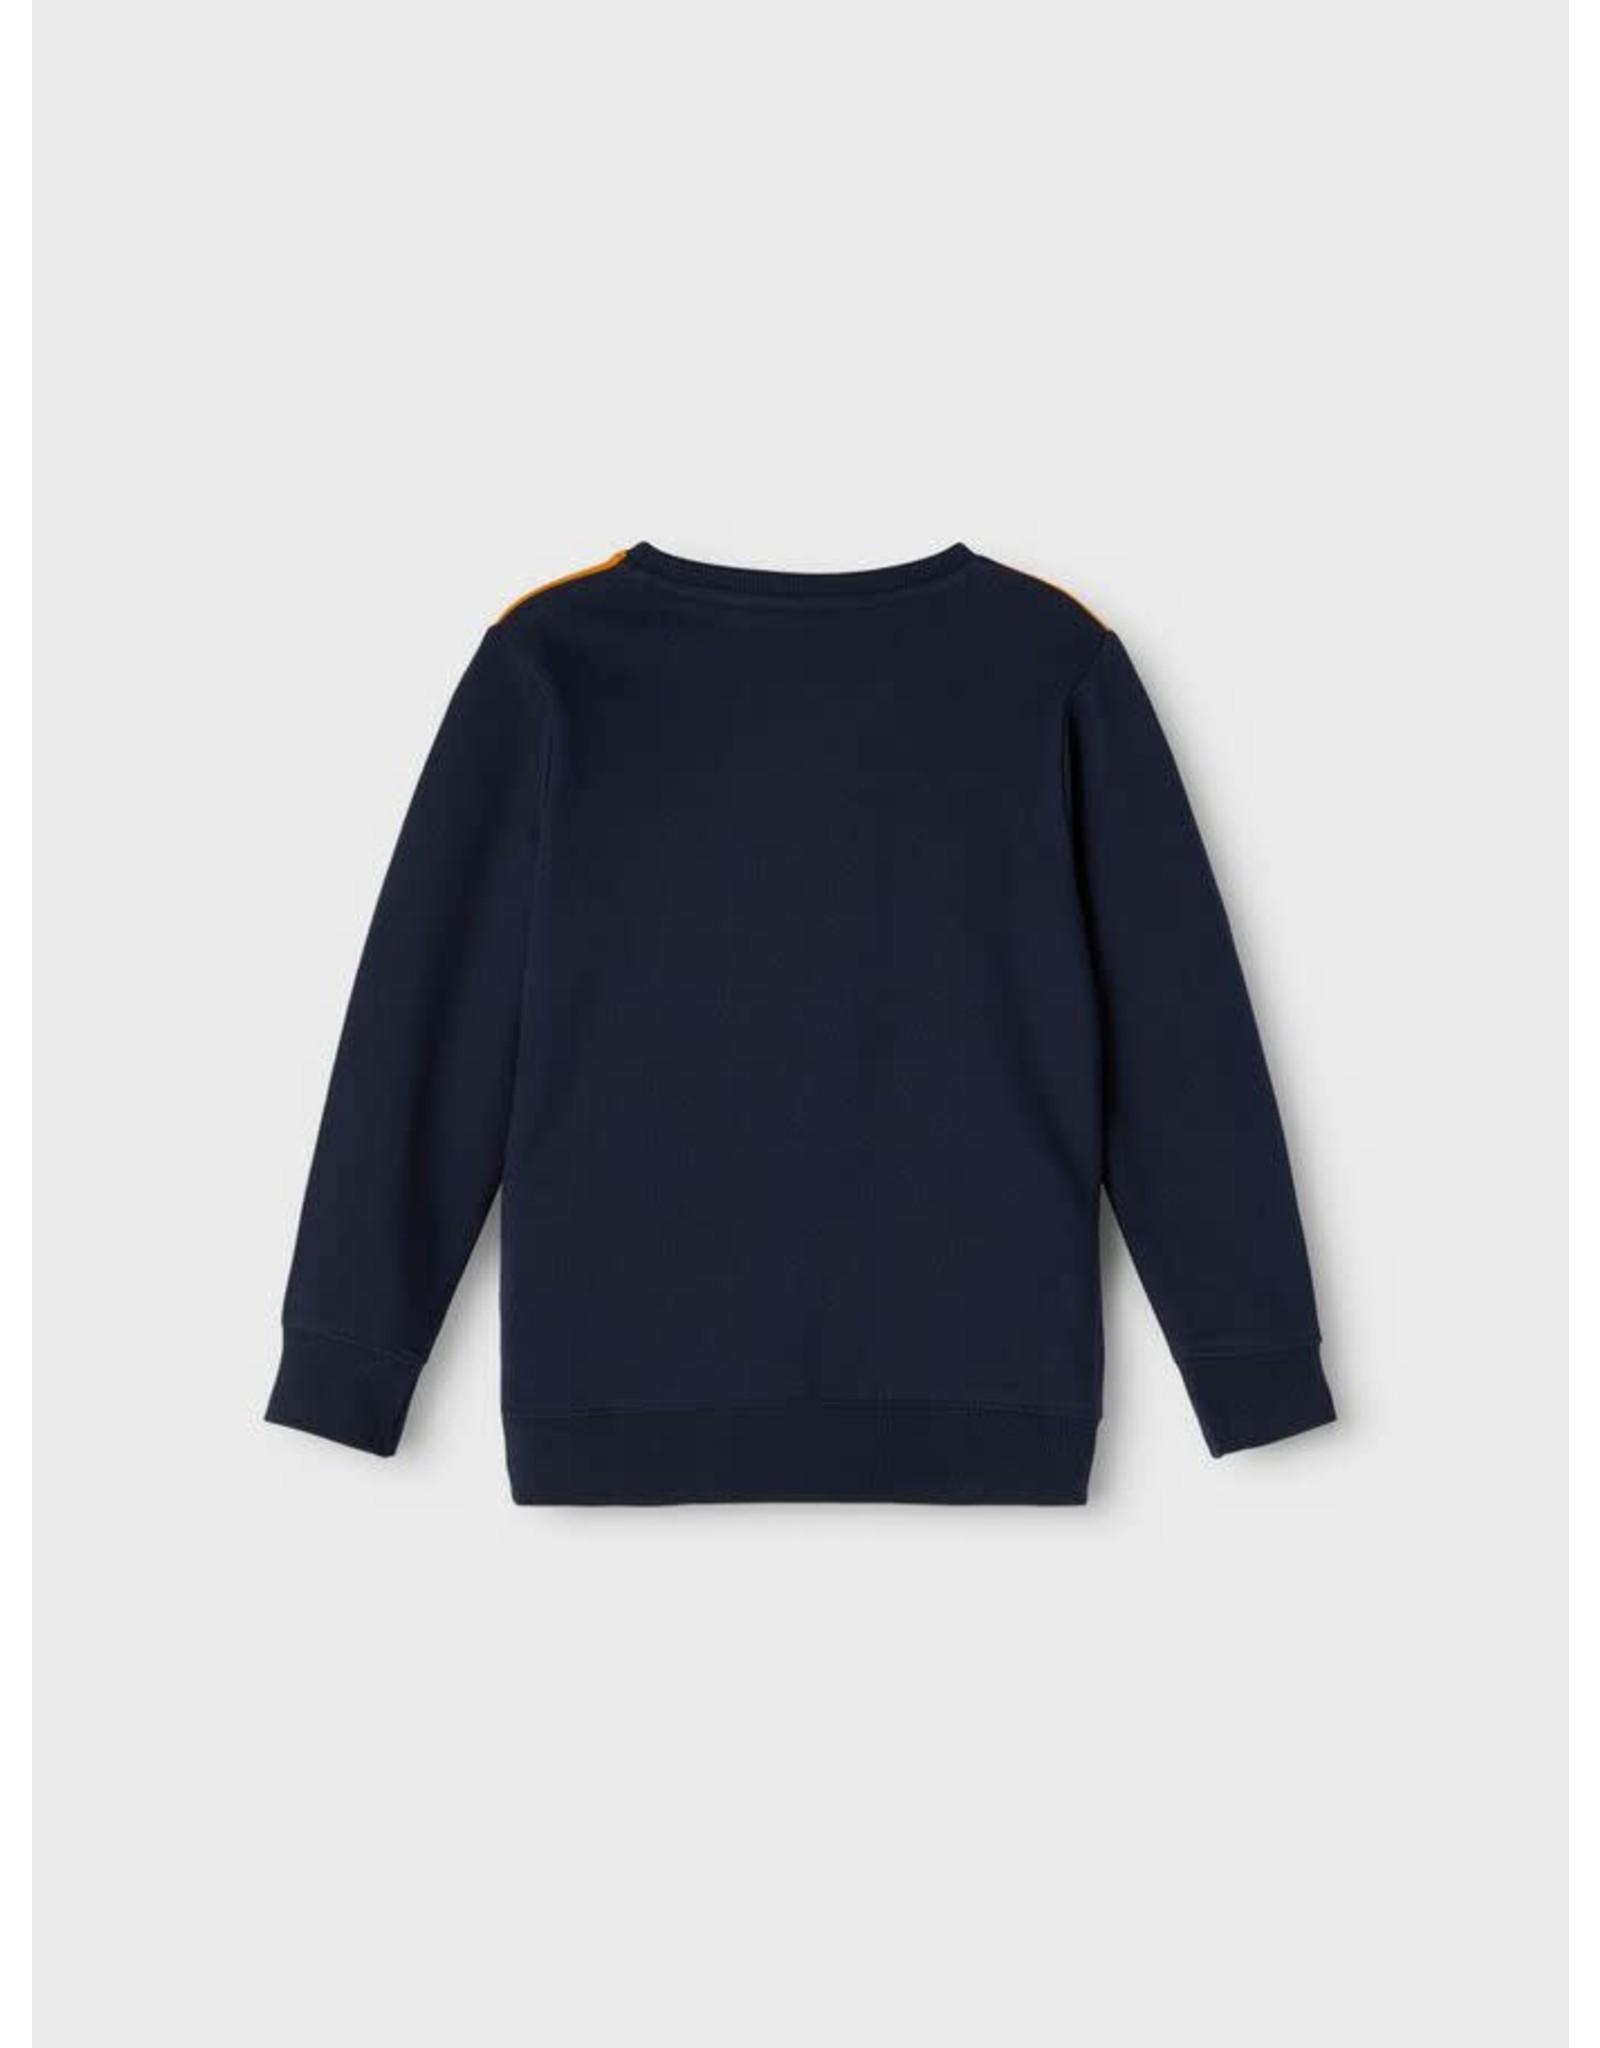 Name It Stoere sweatshirt trui